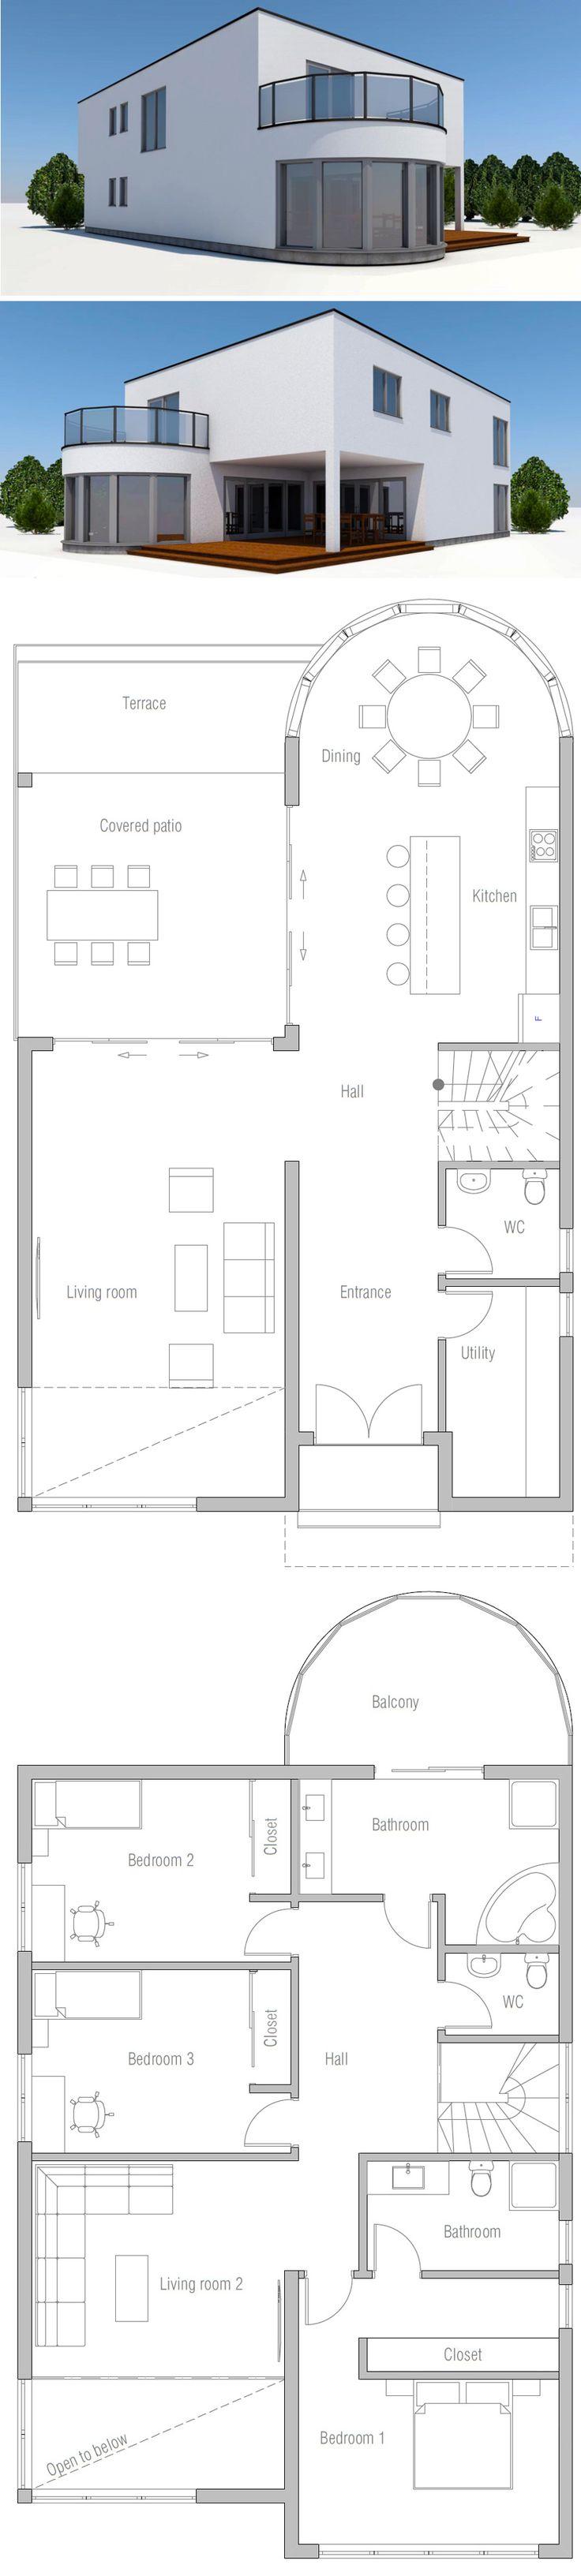 1000+ ideas about Villa Plan on Pinterest Blueprints of houses ... - ^